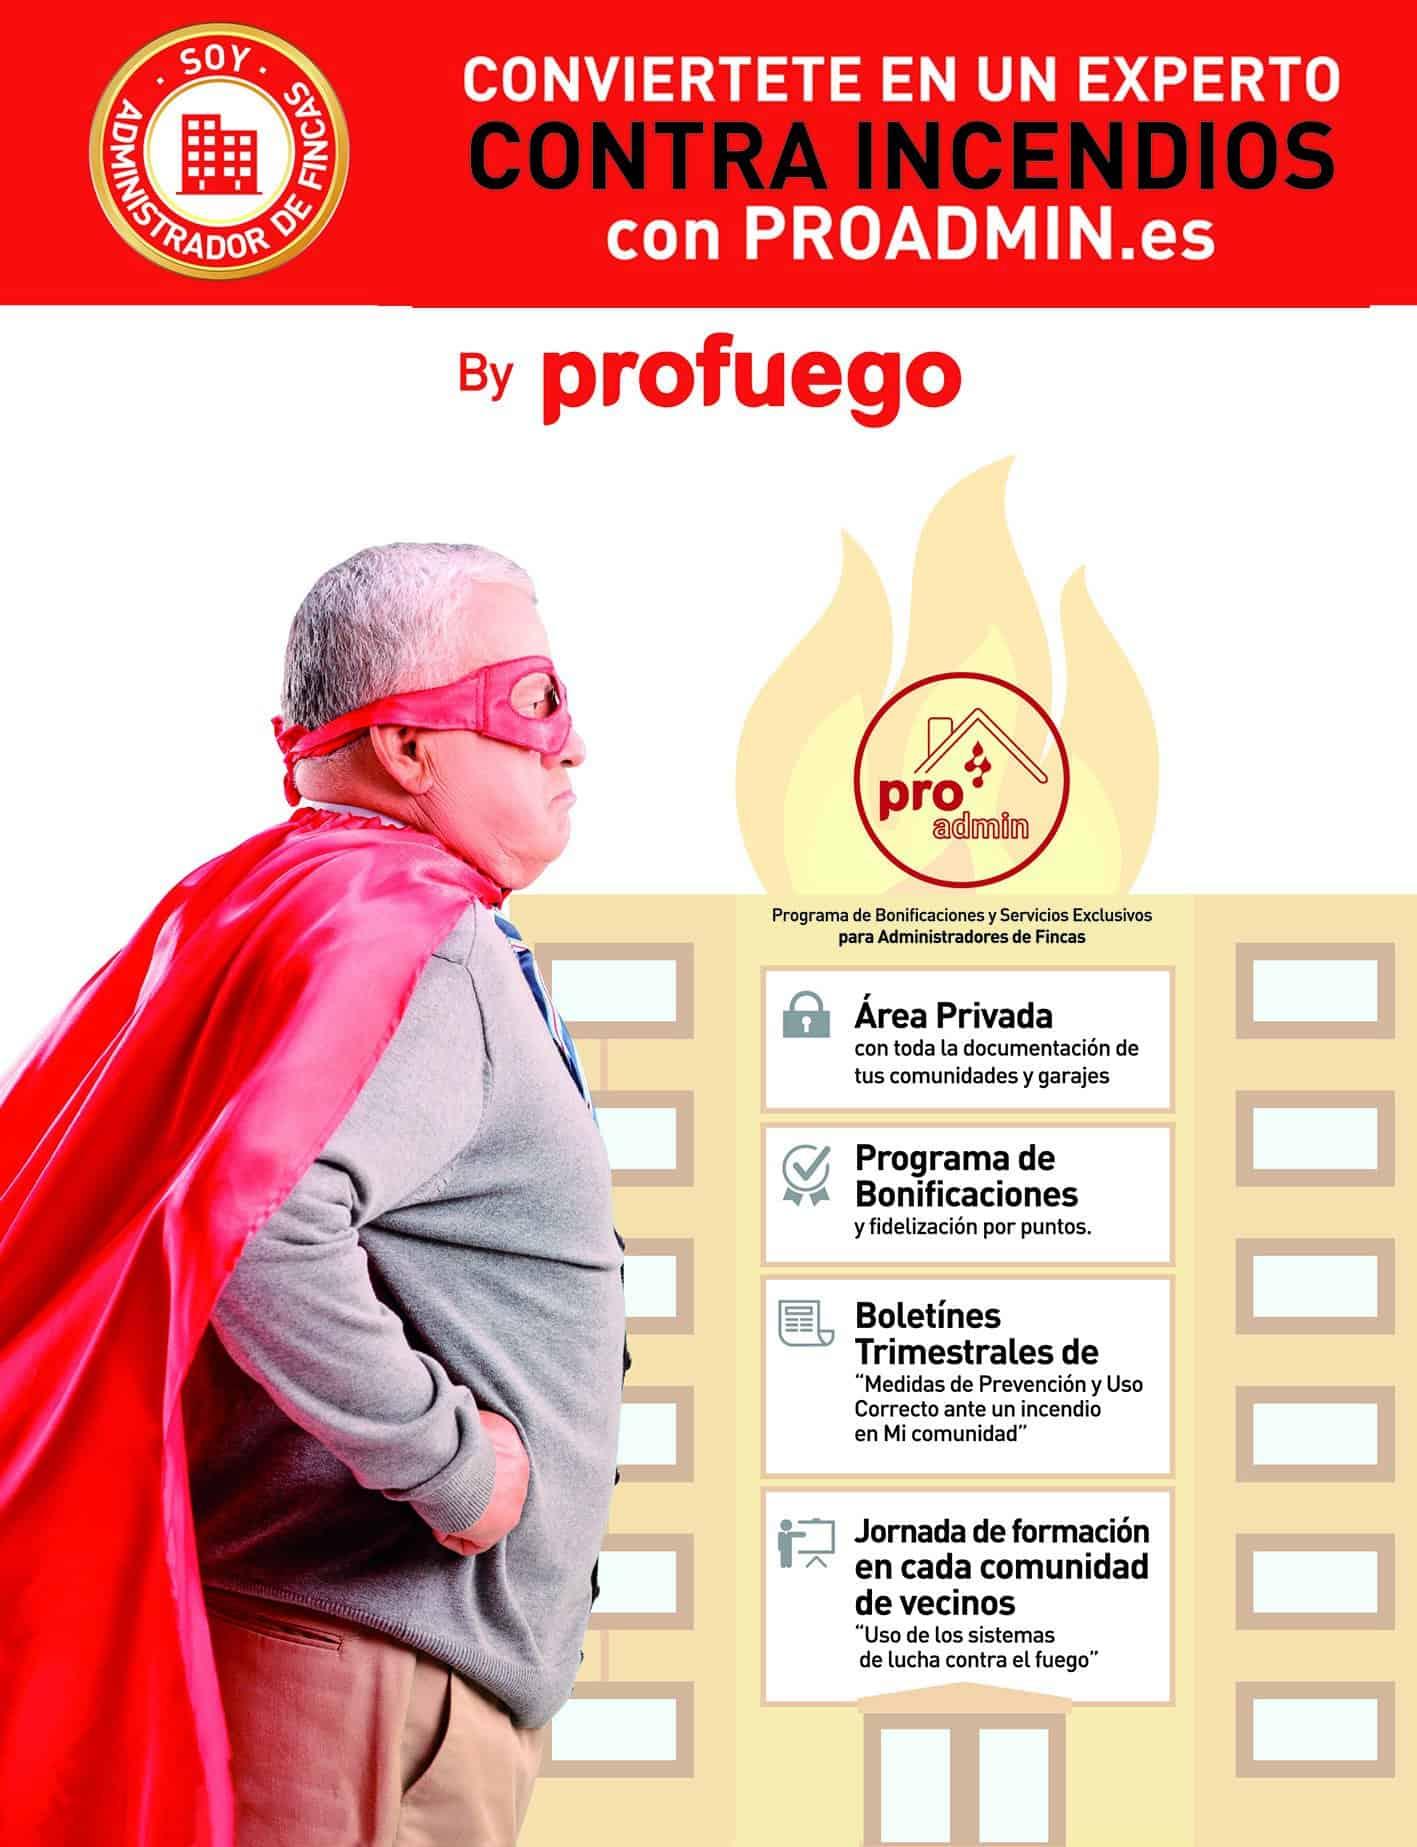 Proadmin mantenimiento extintores